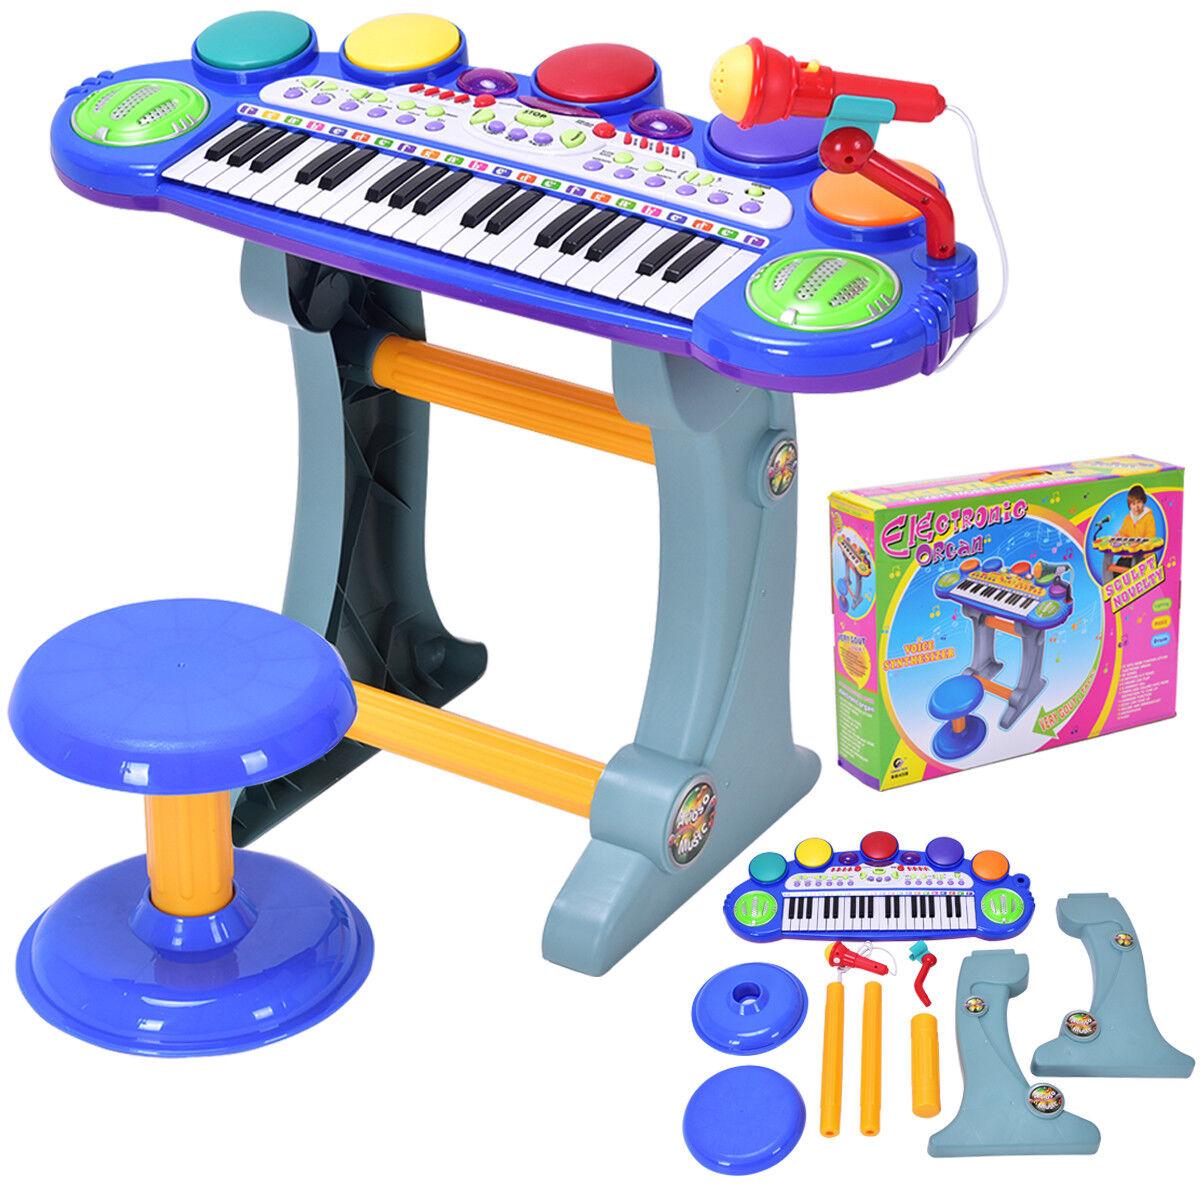 37 Key Kids Musical Electronic Keyboard Organ Piano Microphone Synthesizer Stool  sc 1 st  eBay & Kids Piano | eBay islam-shia.org